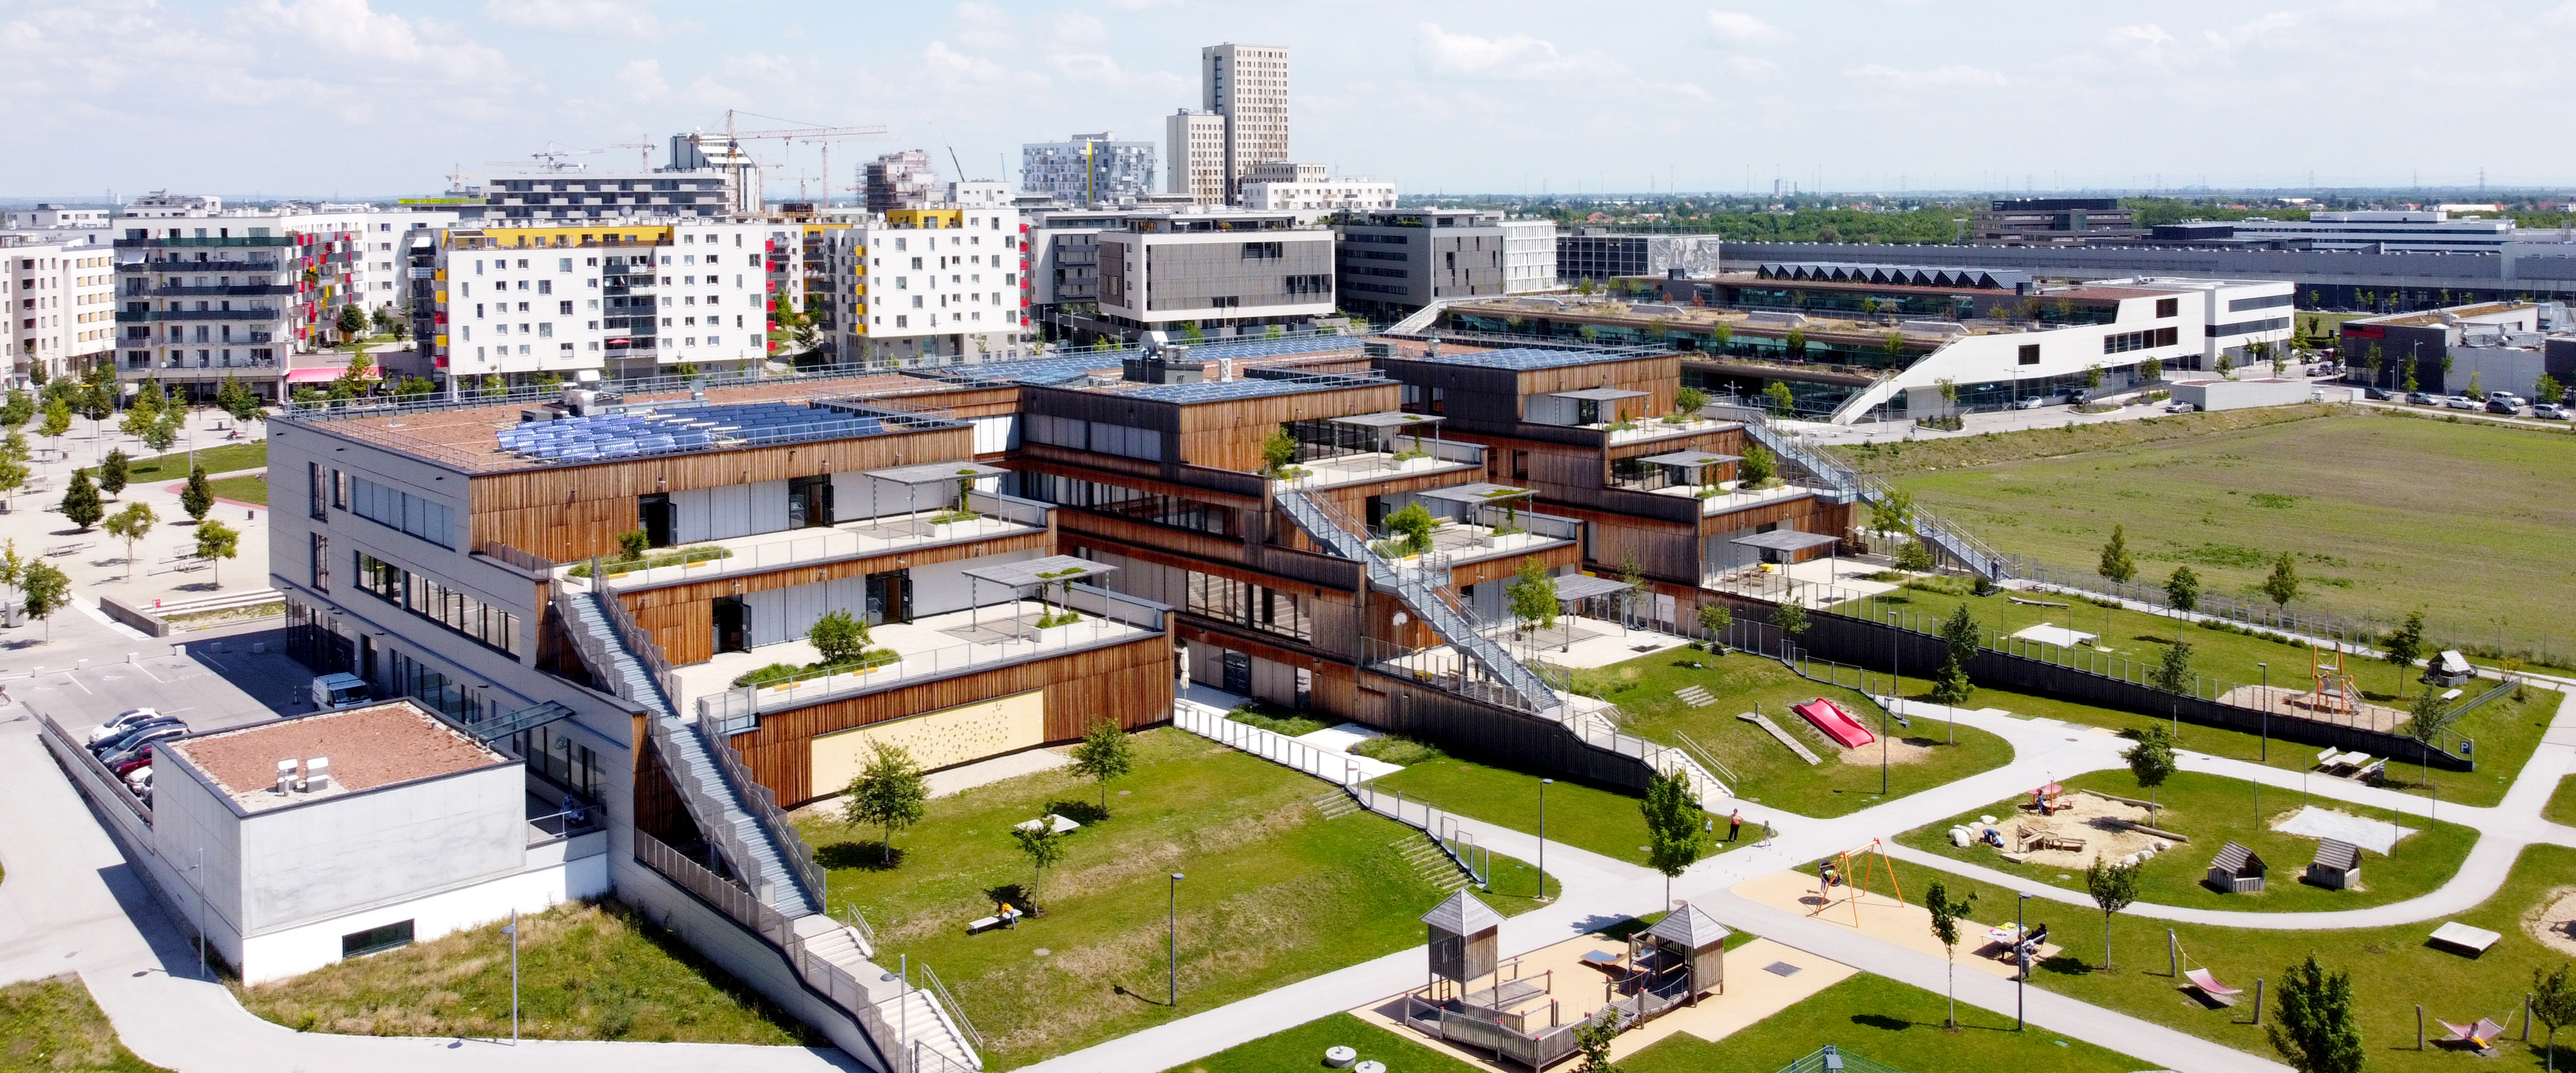 Referenzen communication matters: Aspern Smart City Research (ASCR)